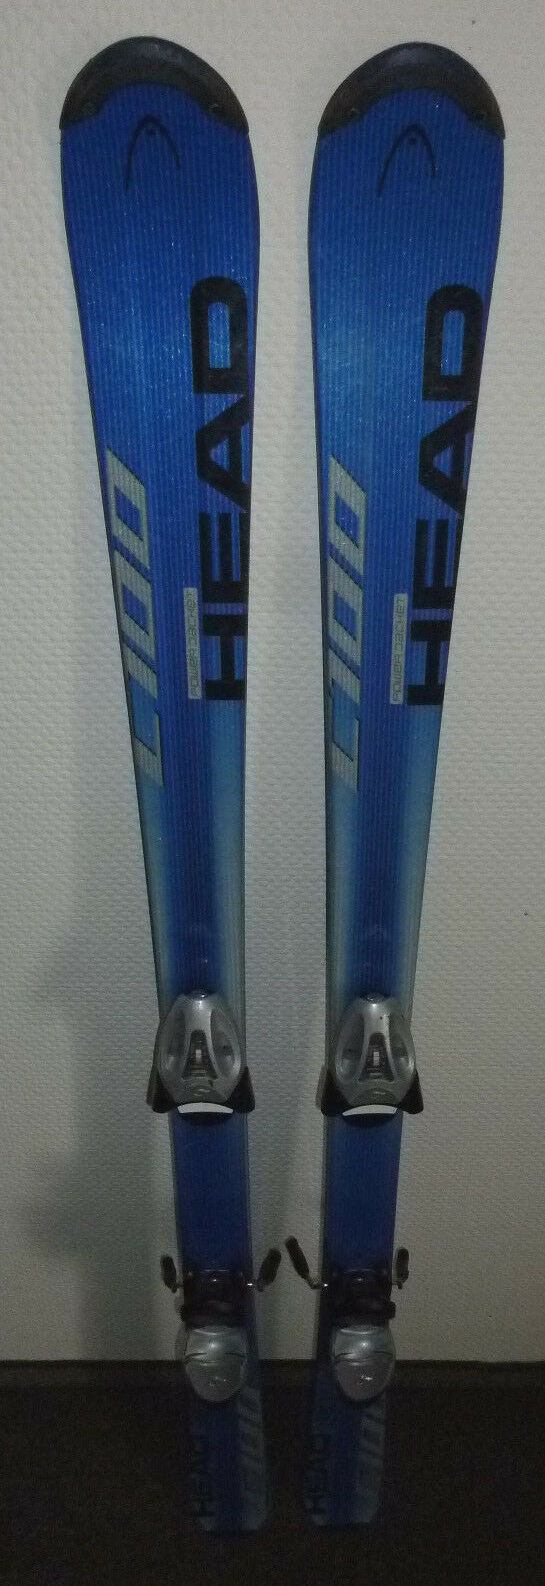 HEAD SKI C100 power jacket lightcore CARVINGSKI 149 cm + Bindung Tyrolia SL100